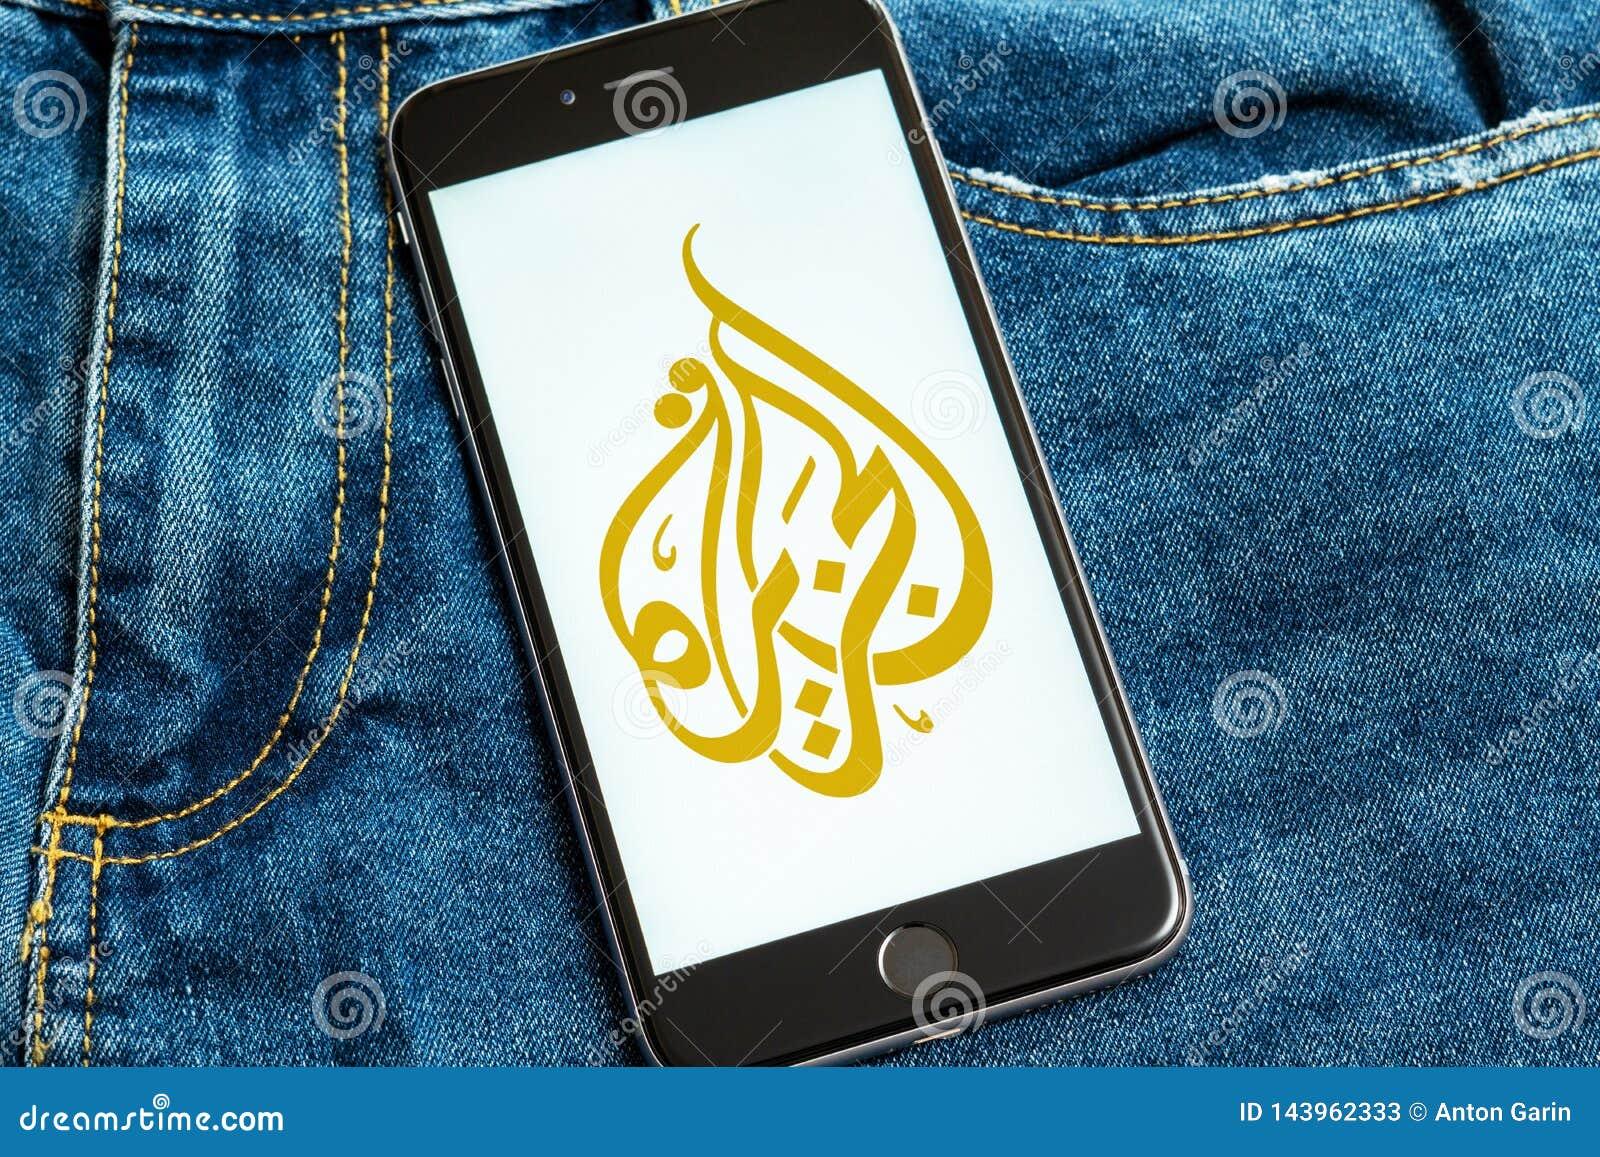 Black phone with logo of news media Al Jazeera on the screen.